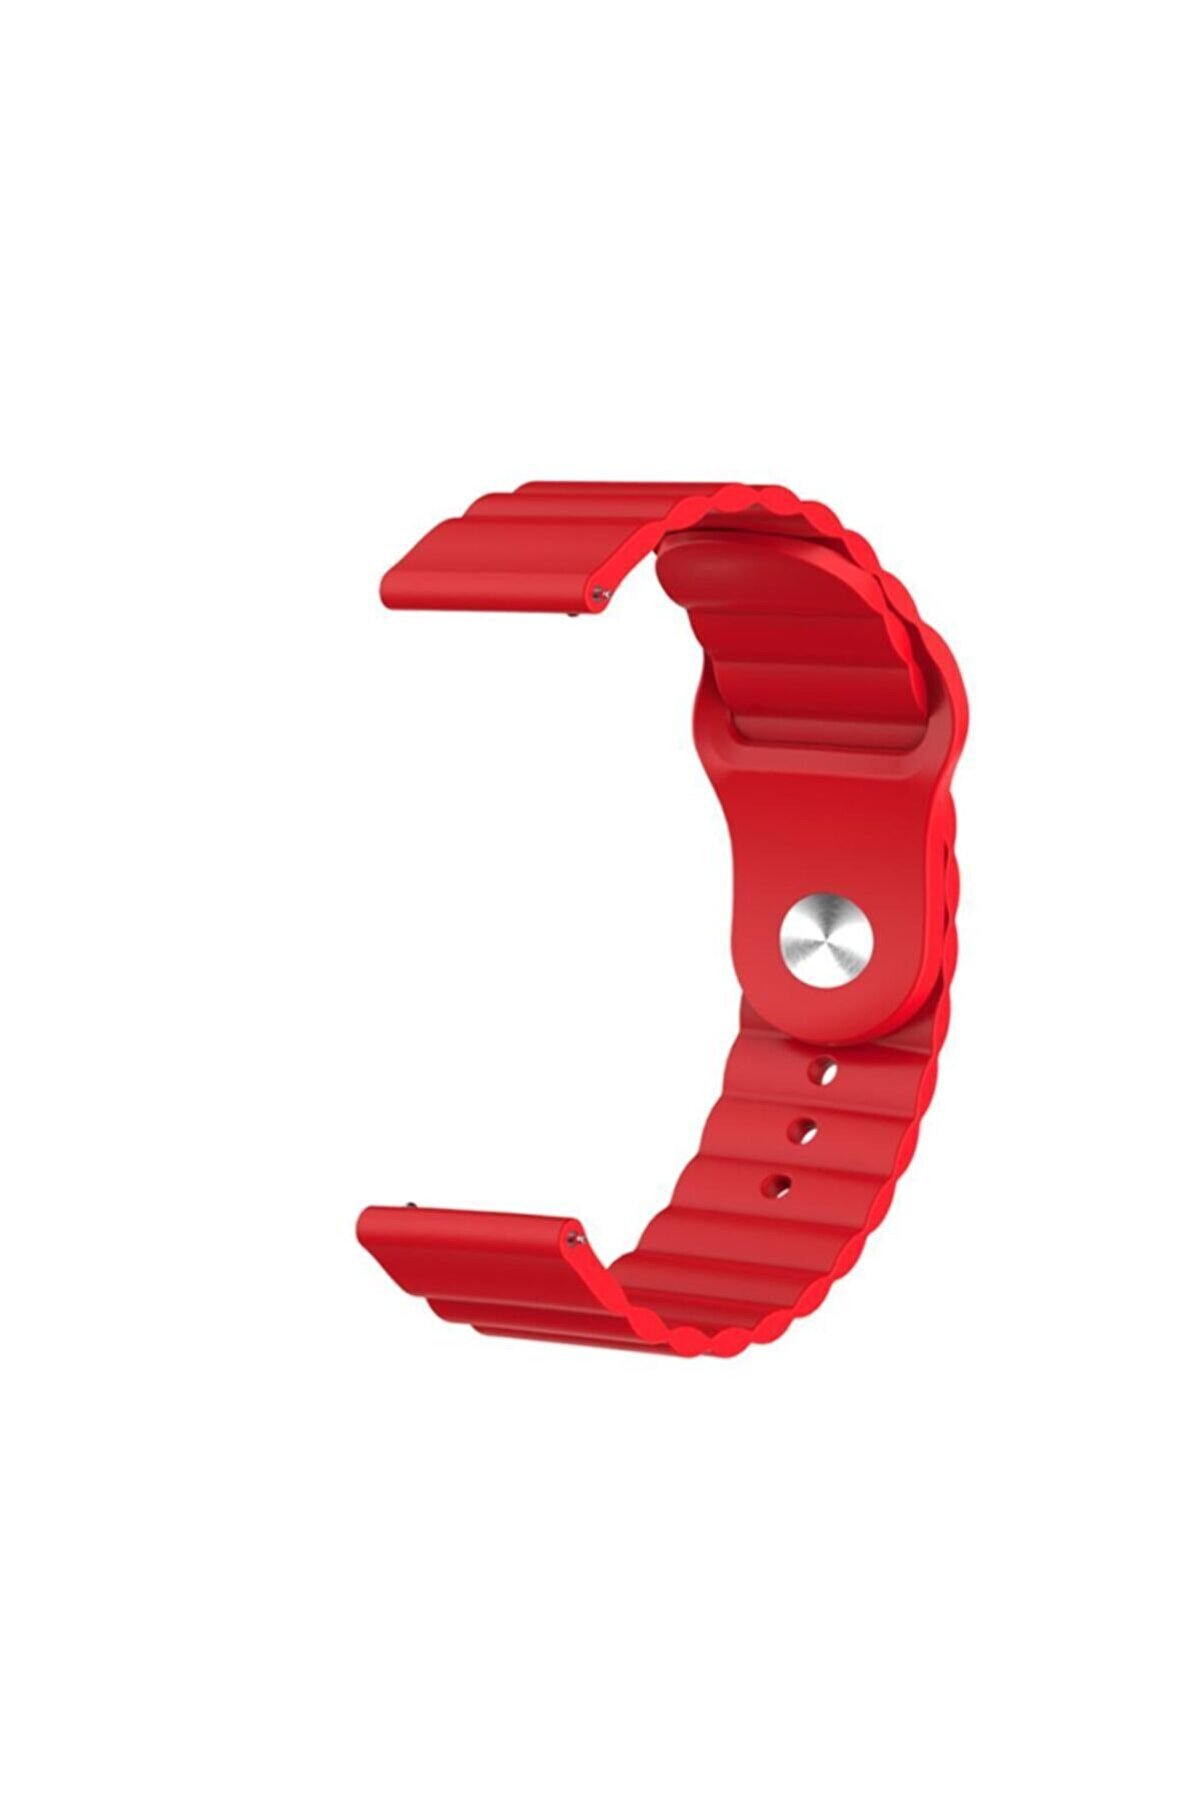 Techmaster Huawei Watch Gt Gt2 Honor Magic Watch 2 Silikon Loop Tme Kordon Kayış